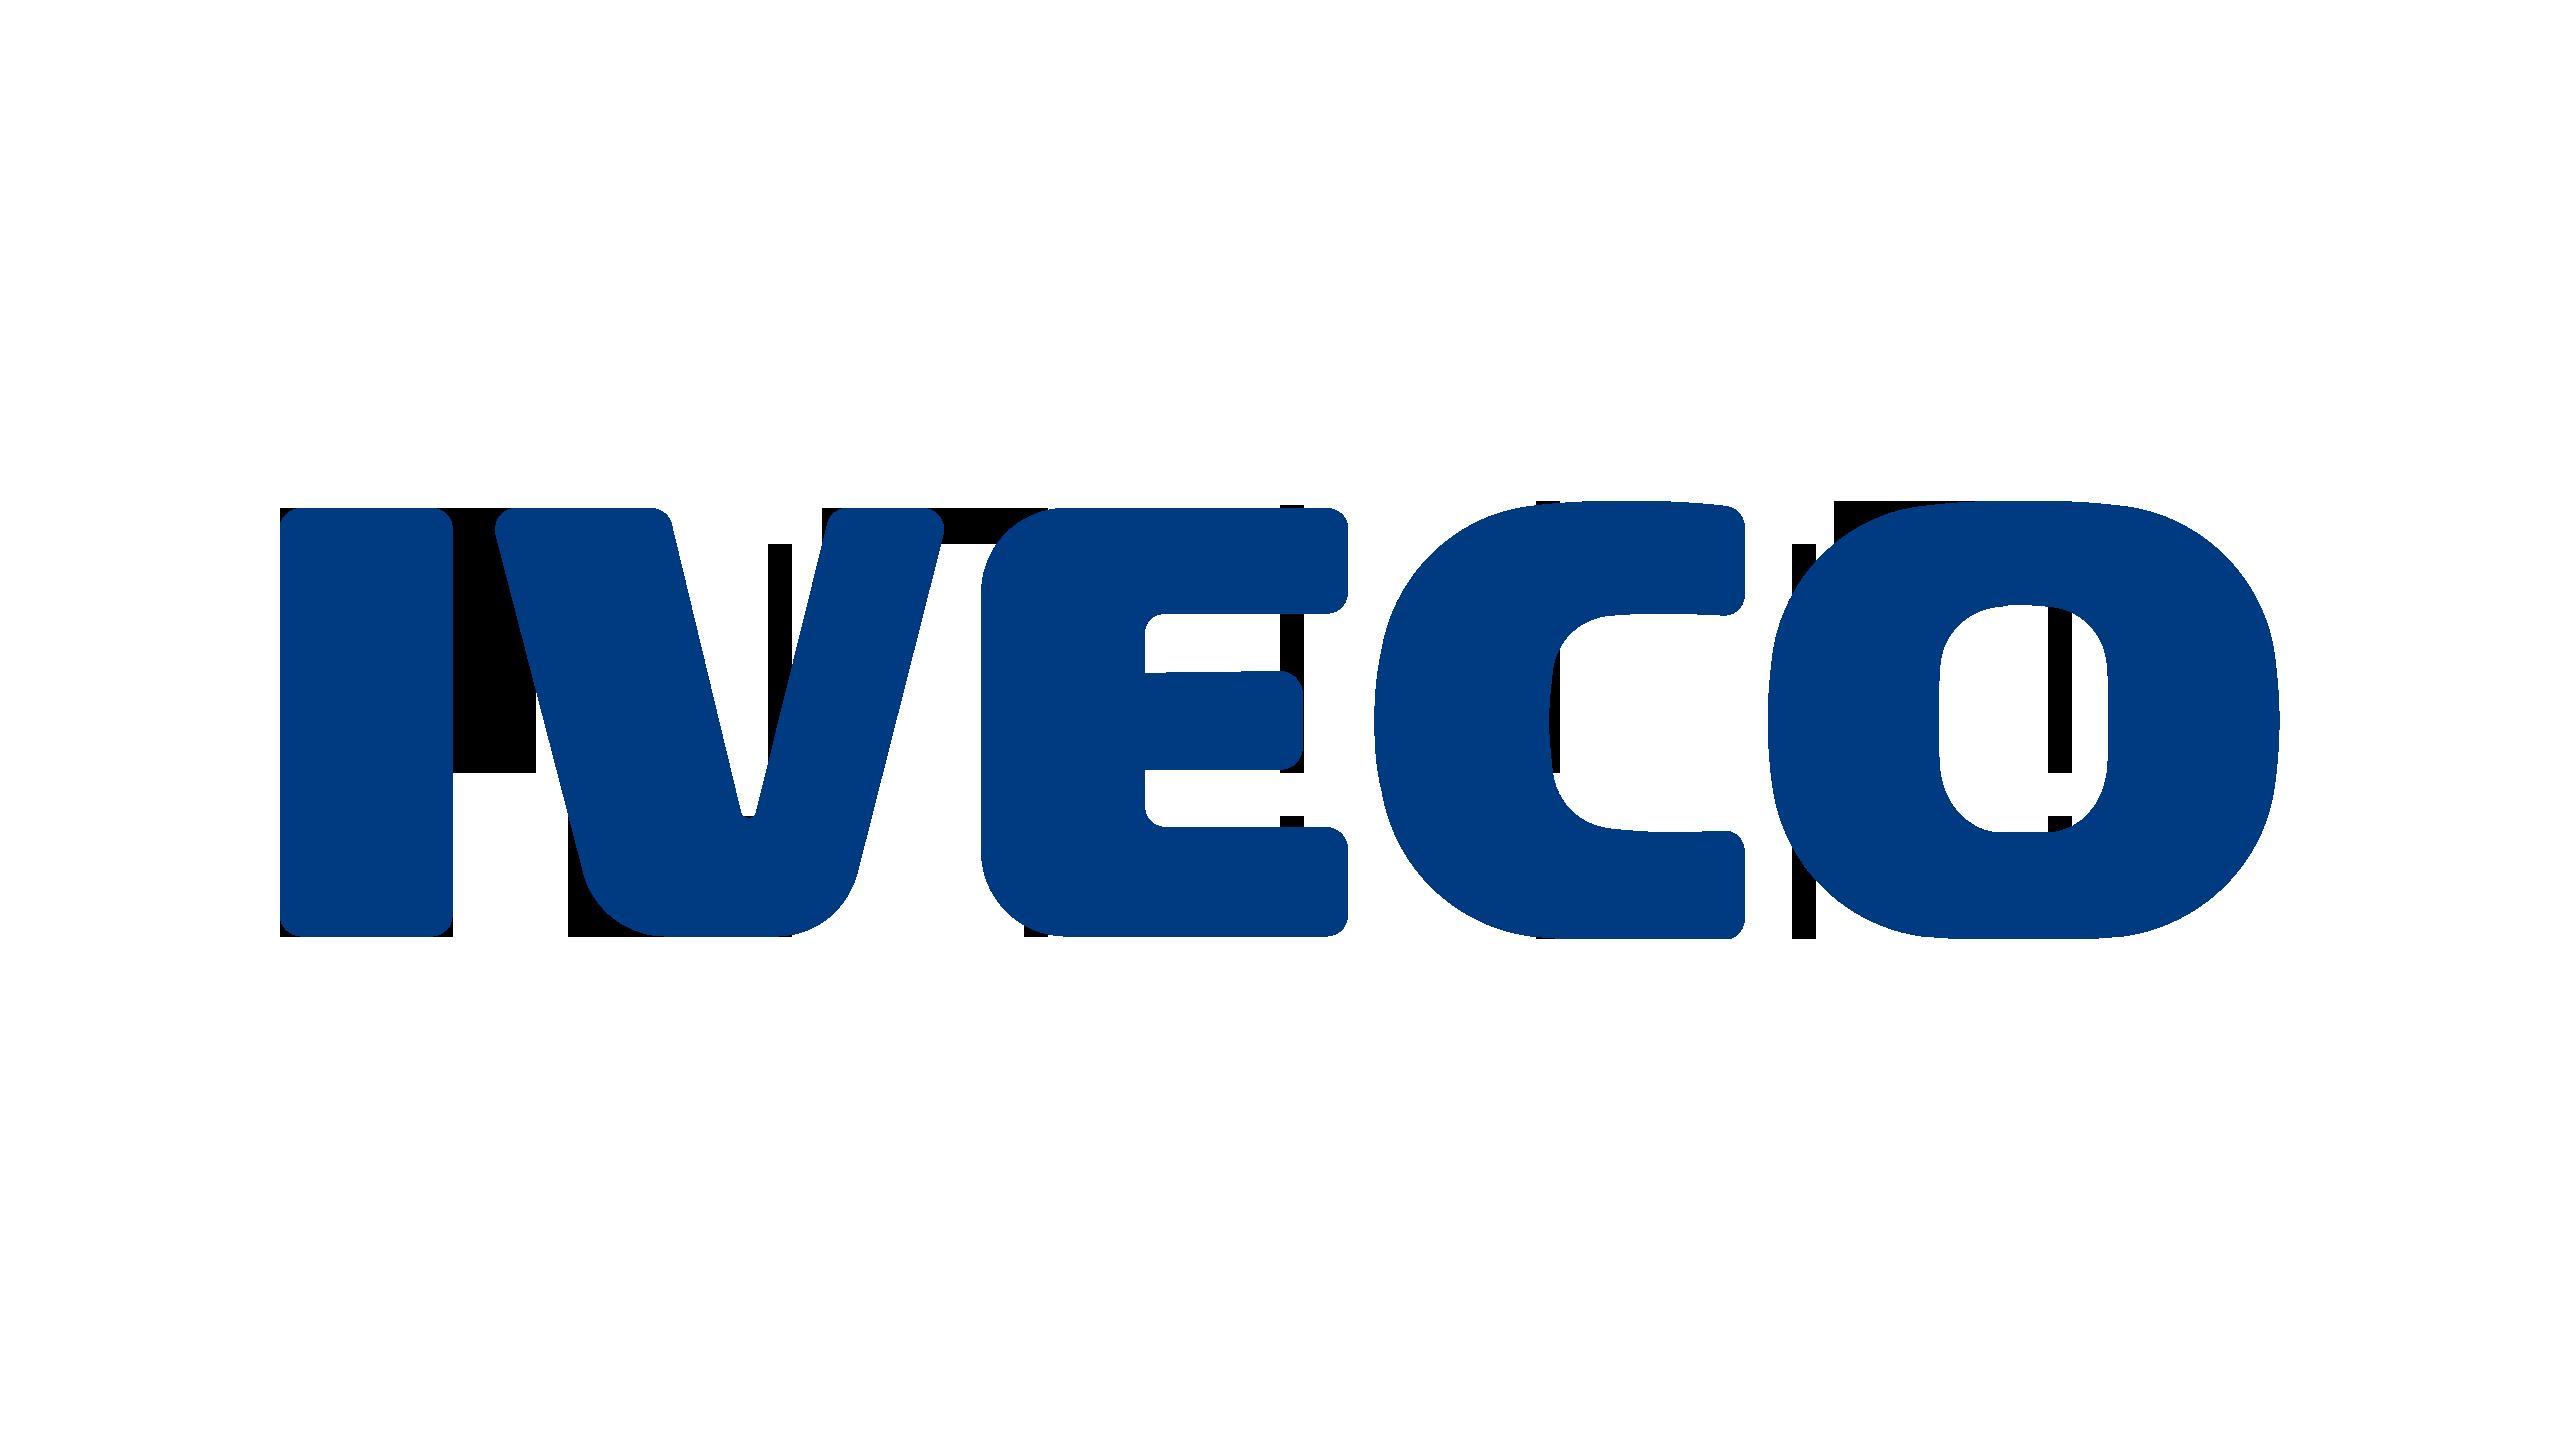 Iveco Logo, HD Png, Information | Carlogos.org